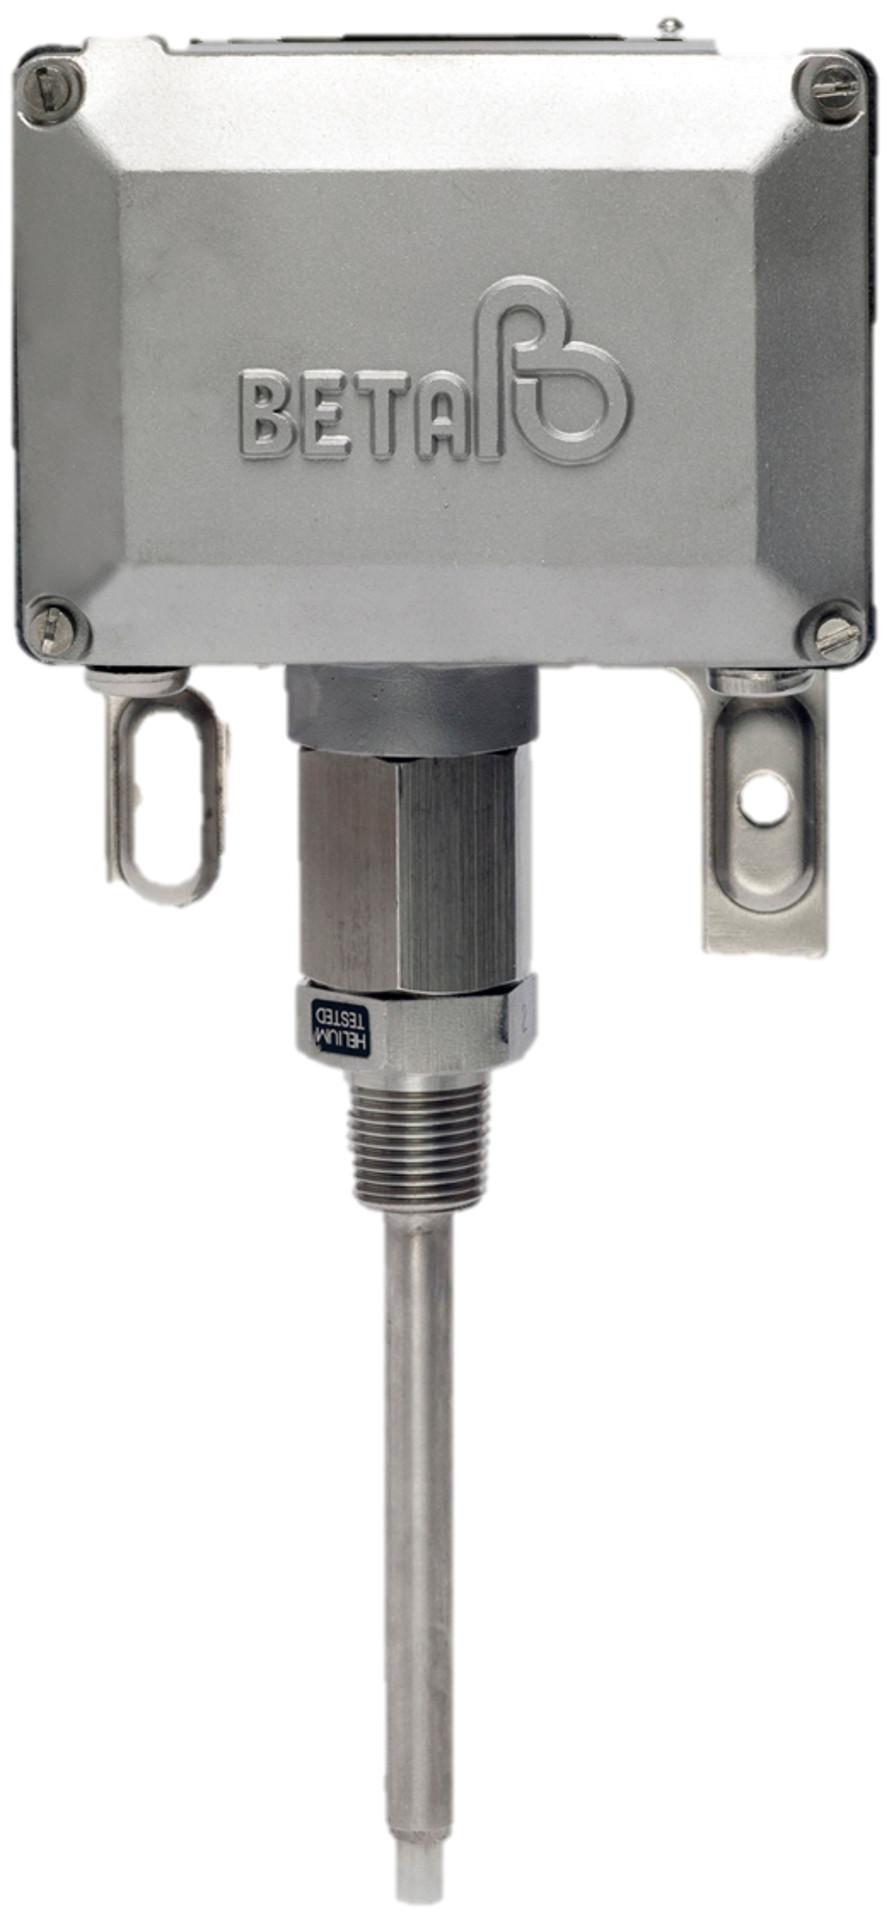 Trykkbryter Temperaturbryter Pressure temperatur switch safety Explosion proof SIL2 Beta